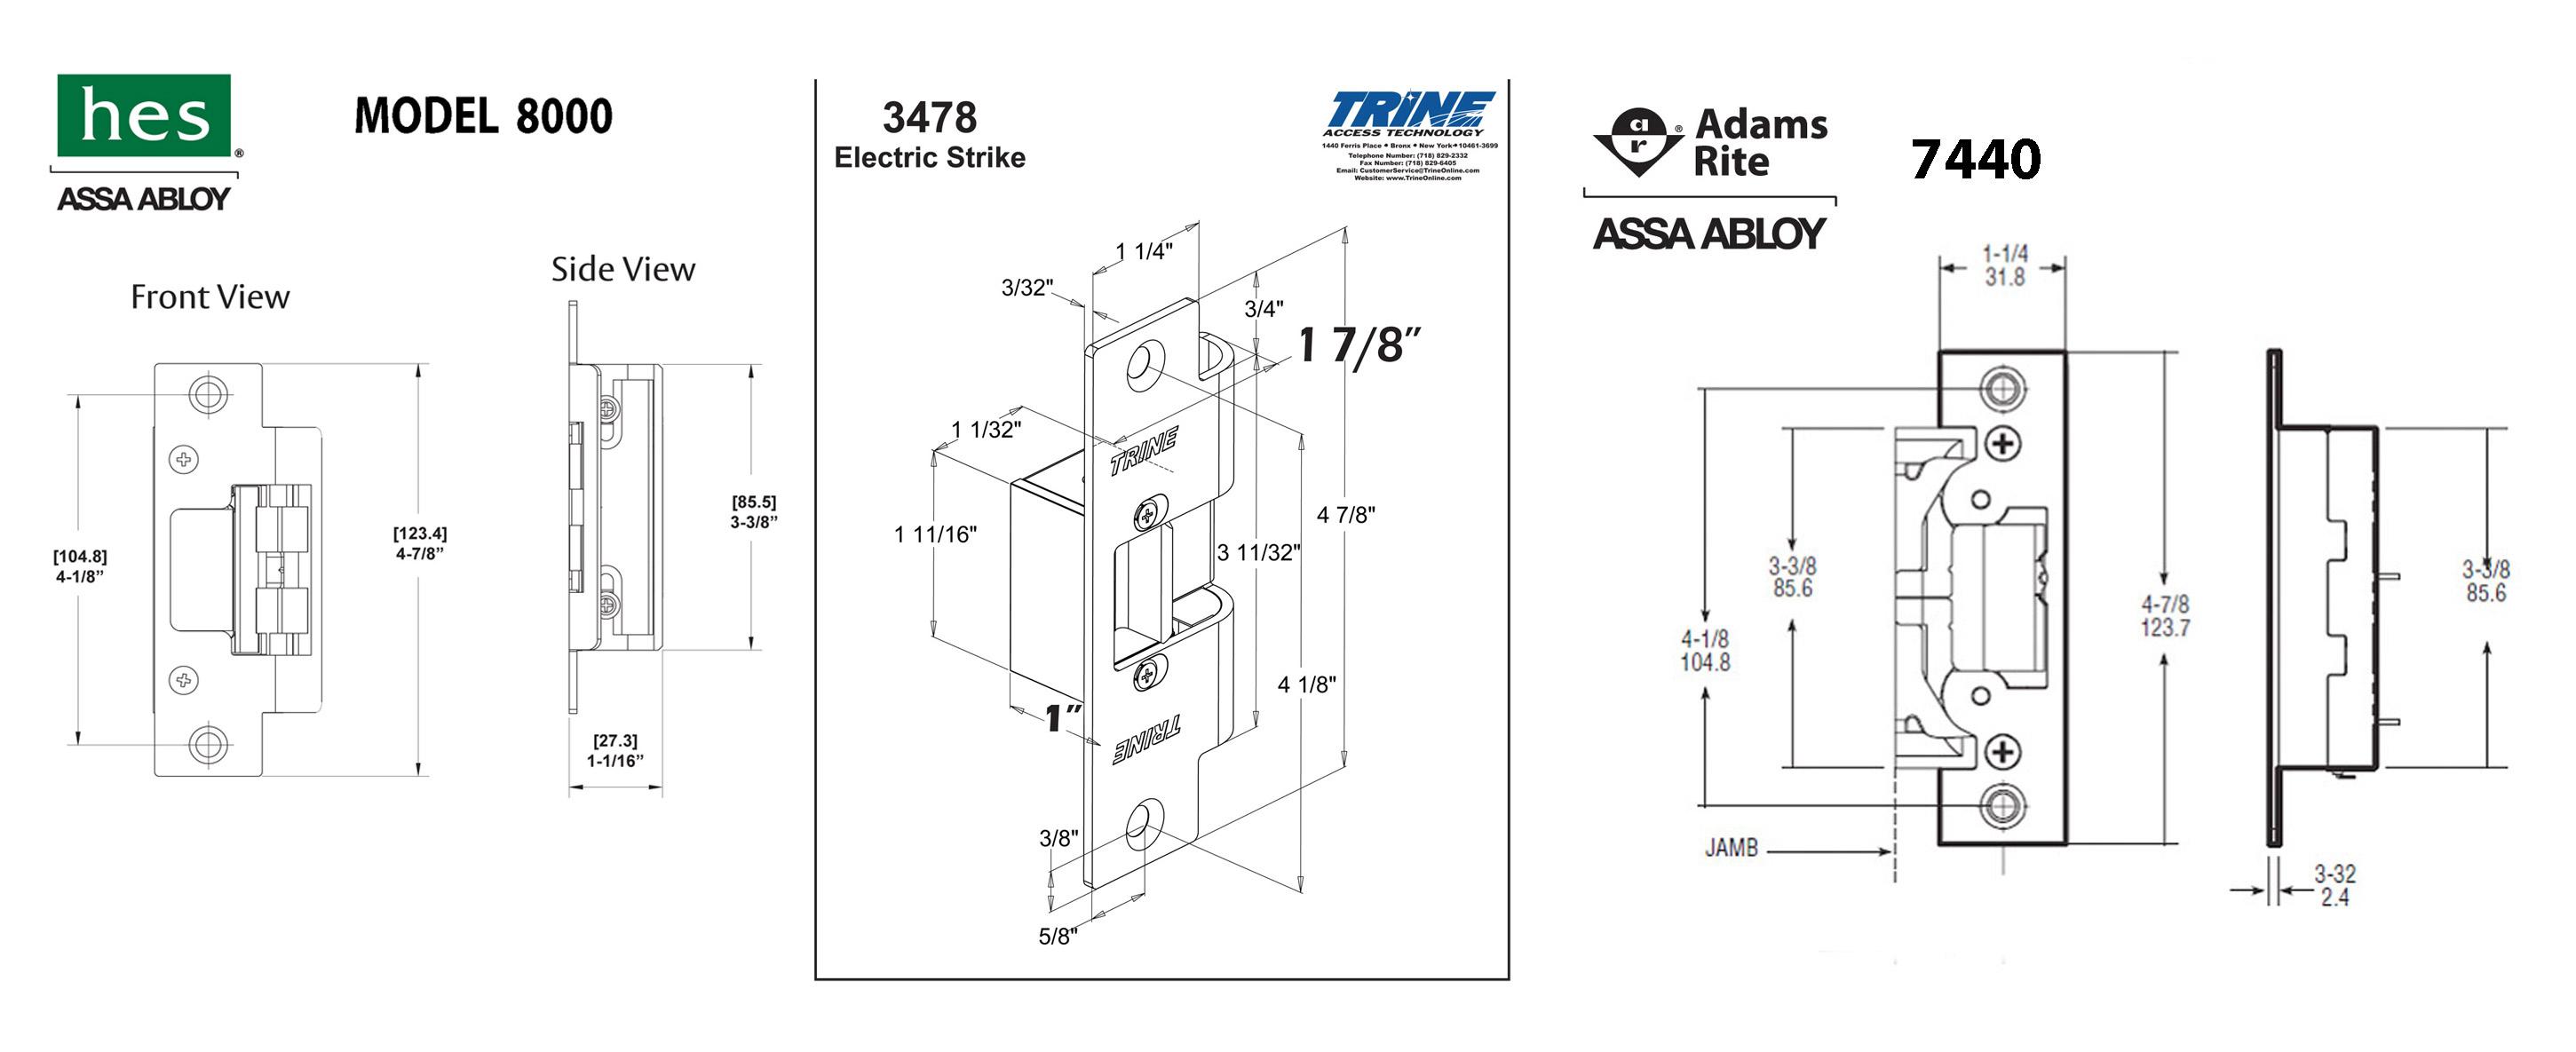 strikethree?resize=665%2C272 hes 1006 electric strike wiring diagram wiring diagram  at n-0.co